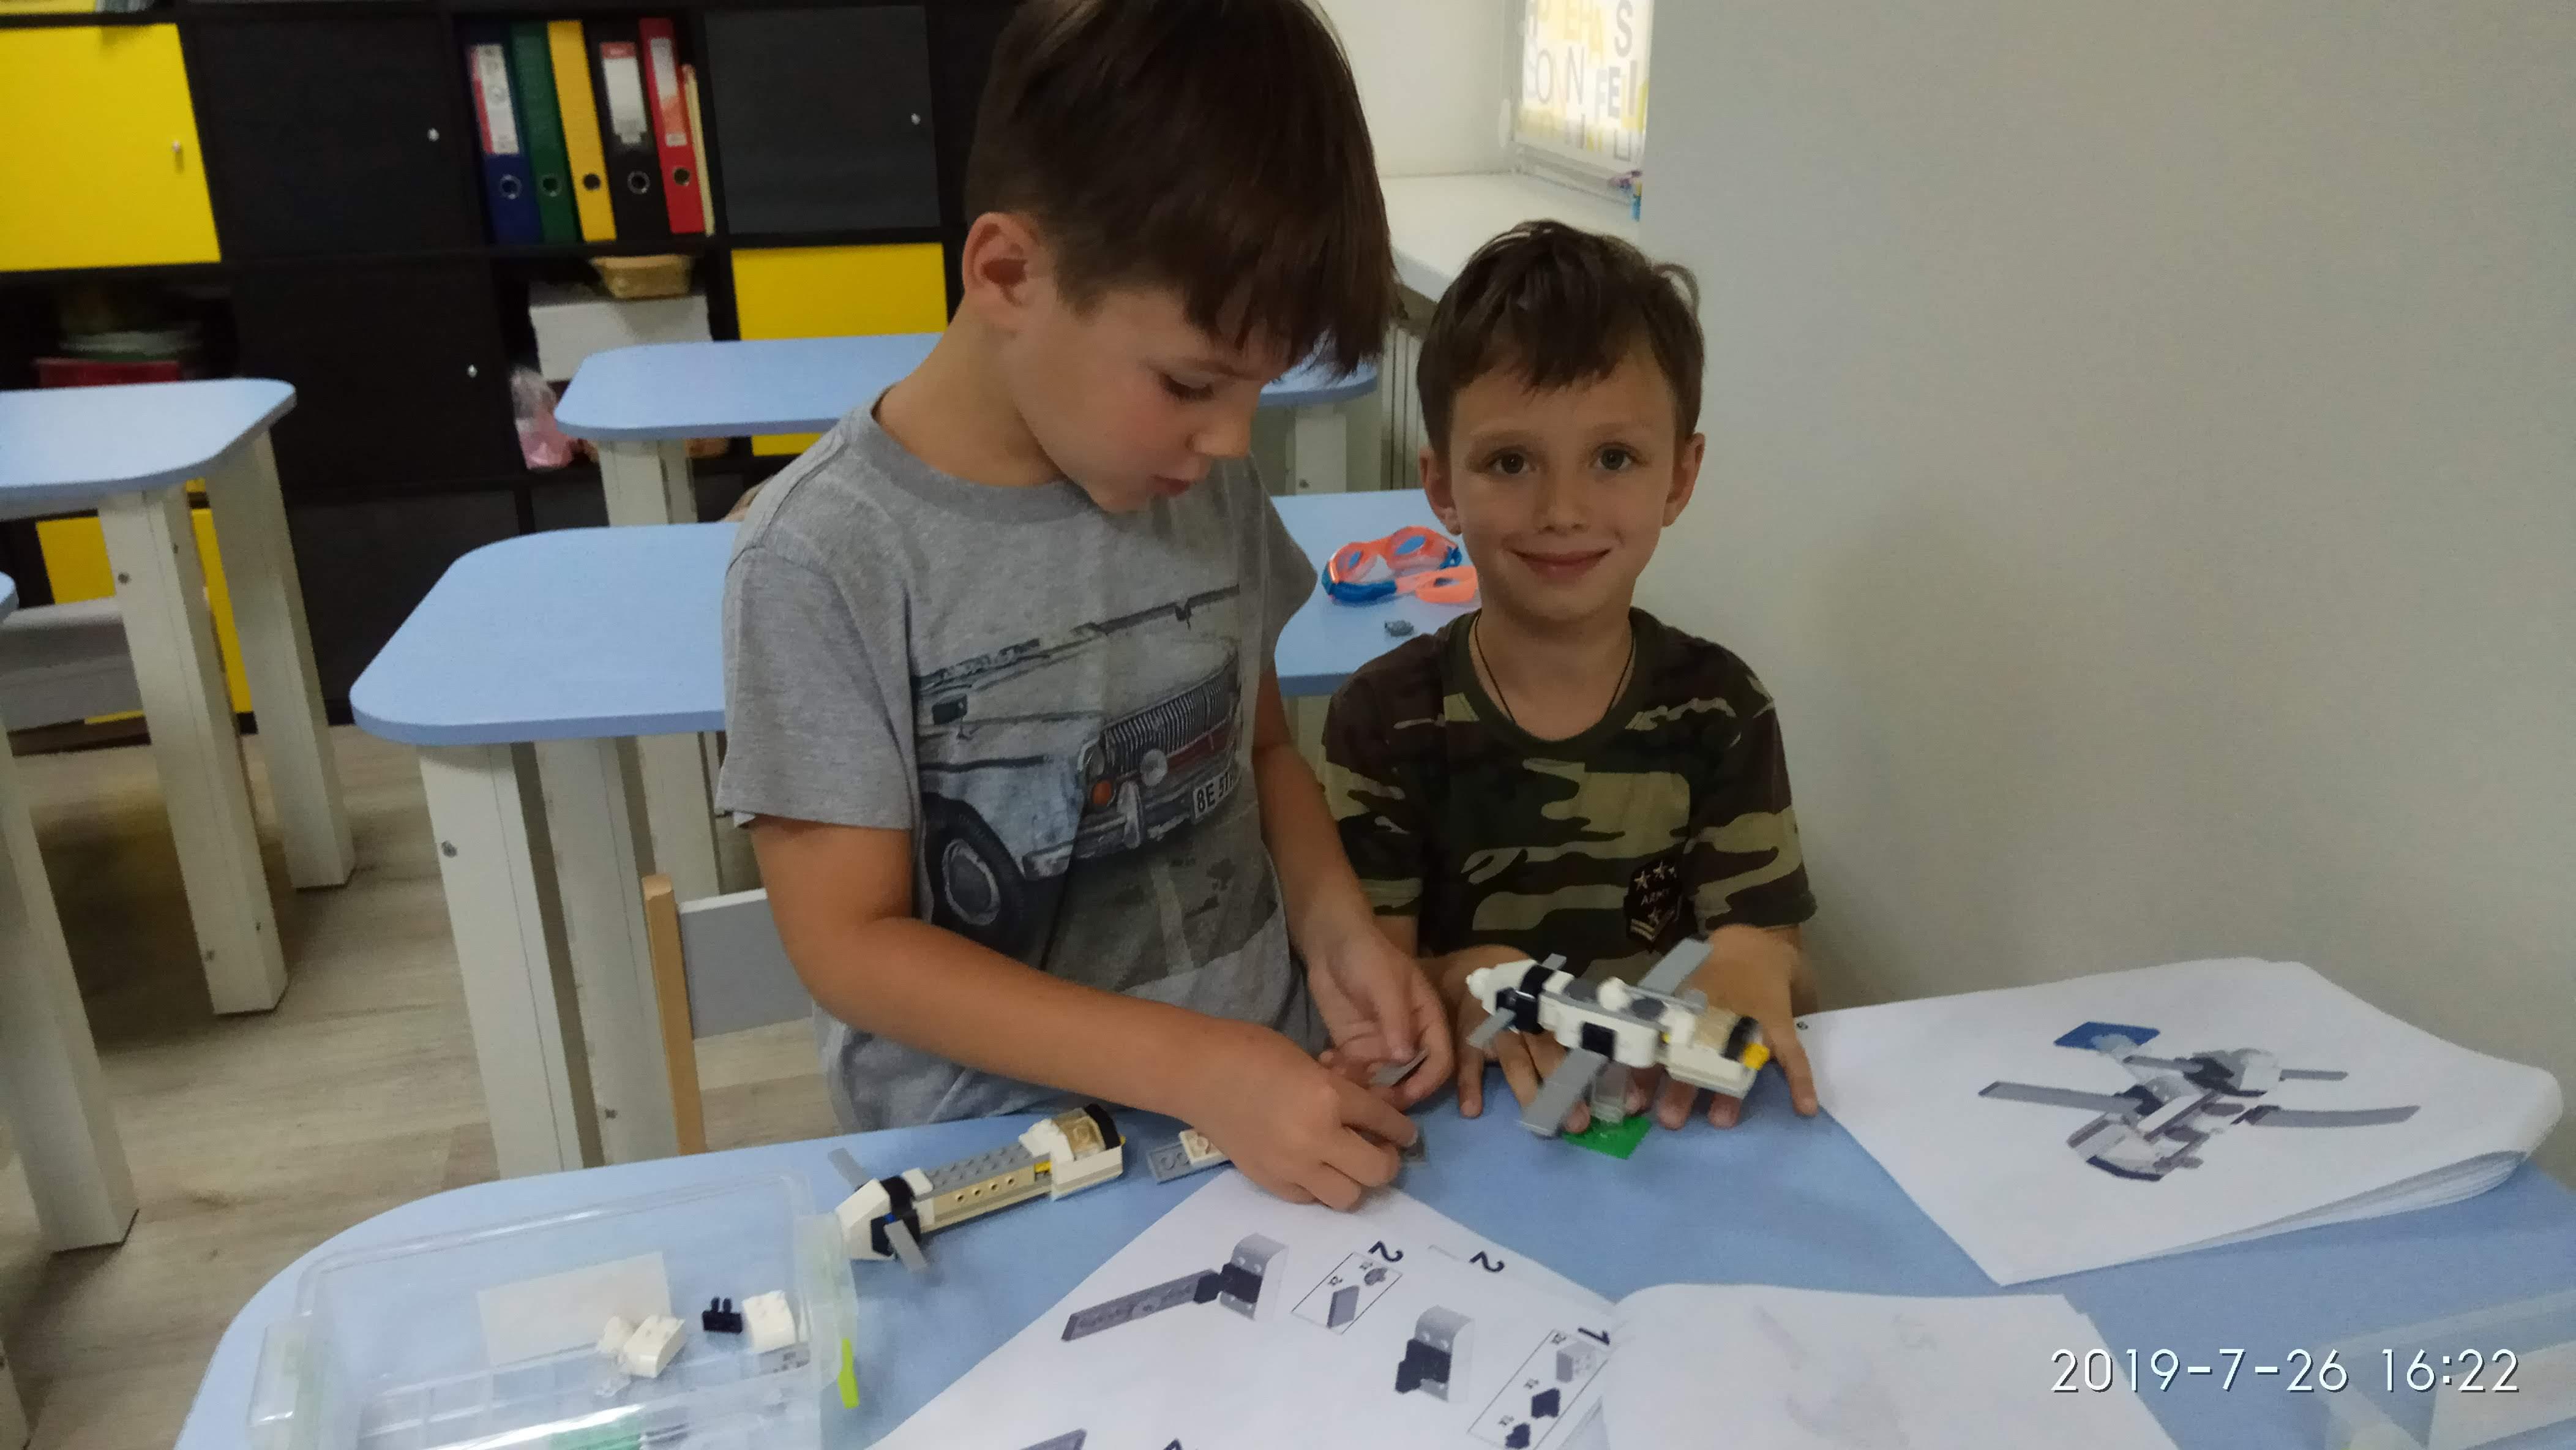 https://akademia-detstva.od.ua/app/uploads/2019/07/IMG_20190726_162206.jpg